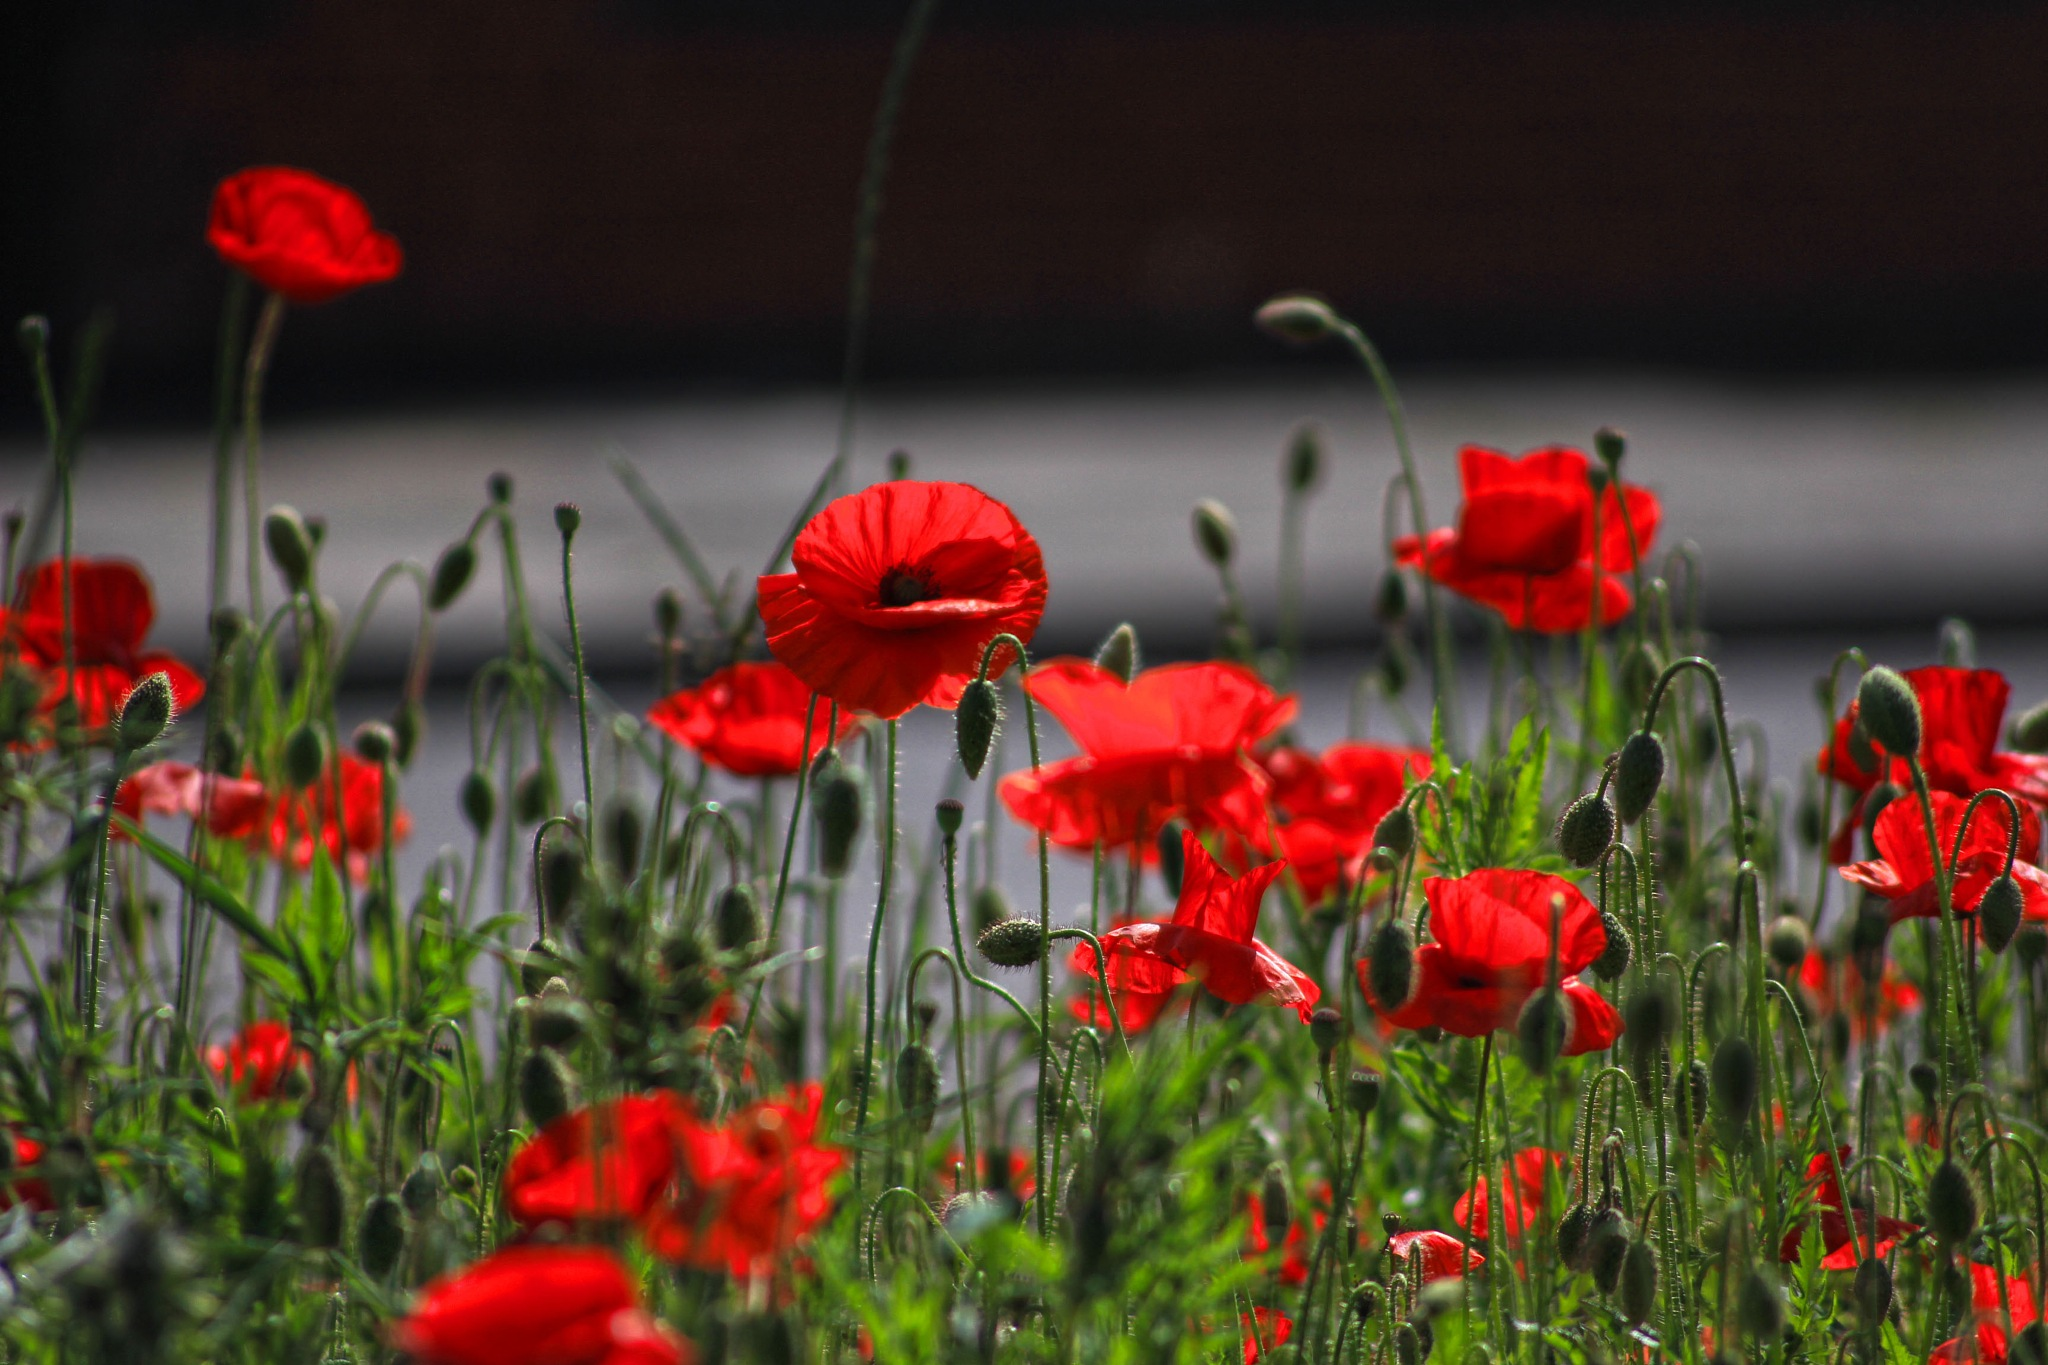 Where Wild Poppies Grow by Mark Pemberton